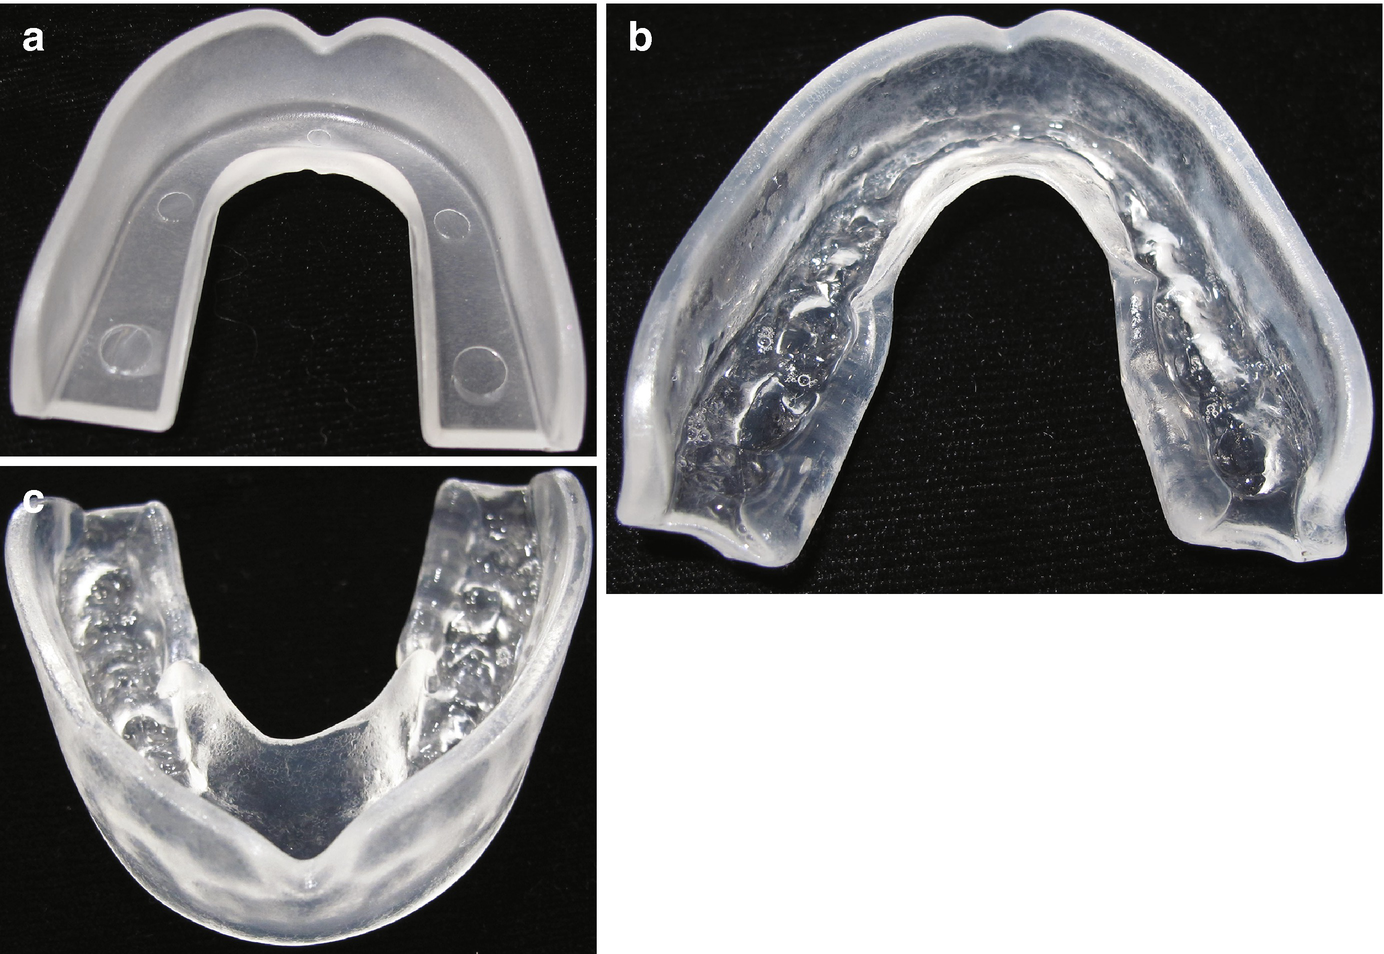 Prevention of Traumatic Dental Injuries | SpringerLink